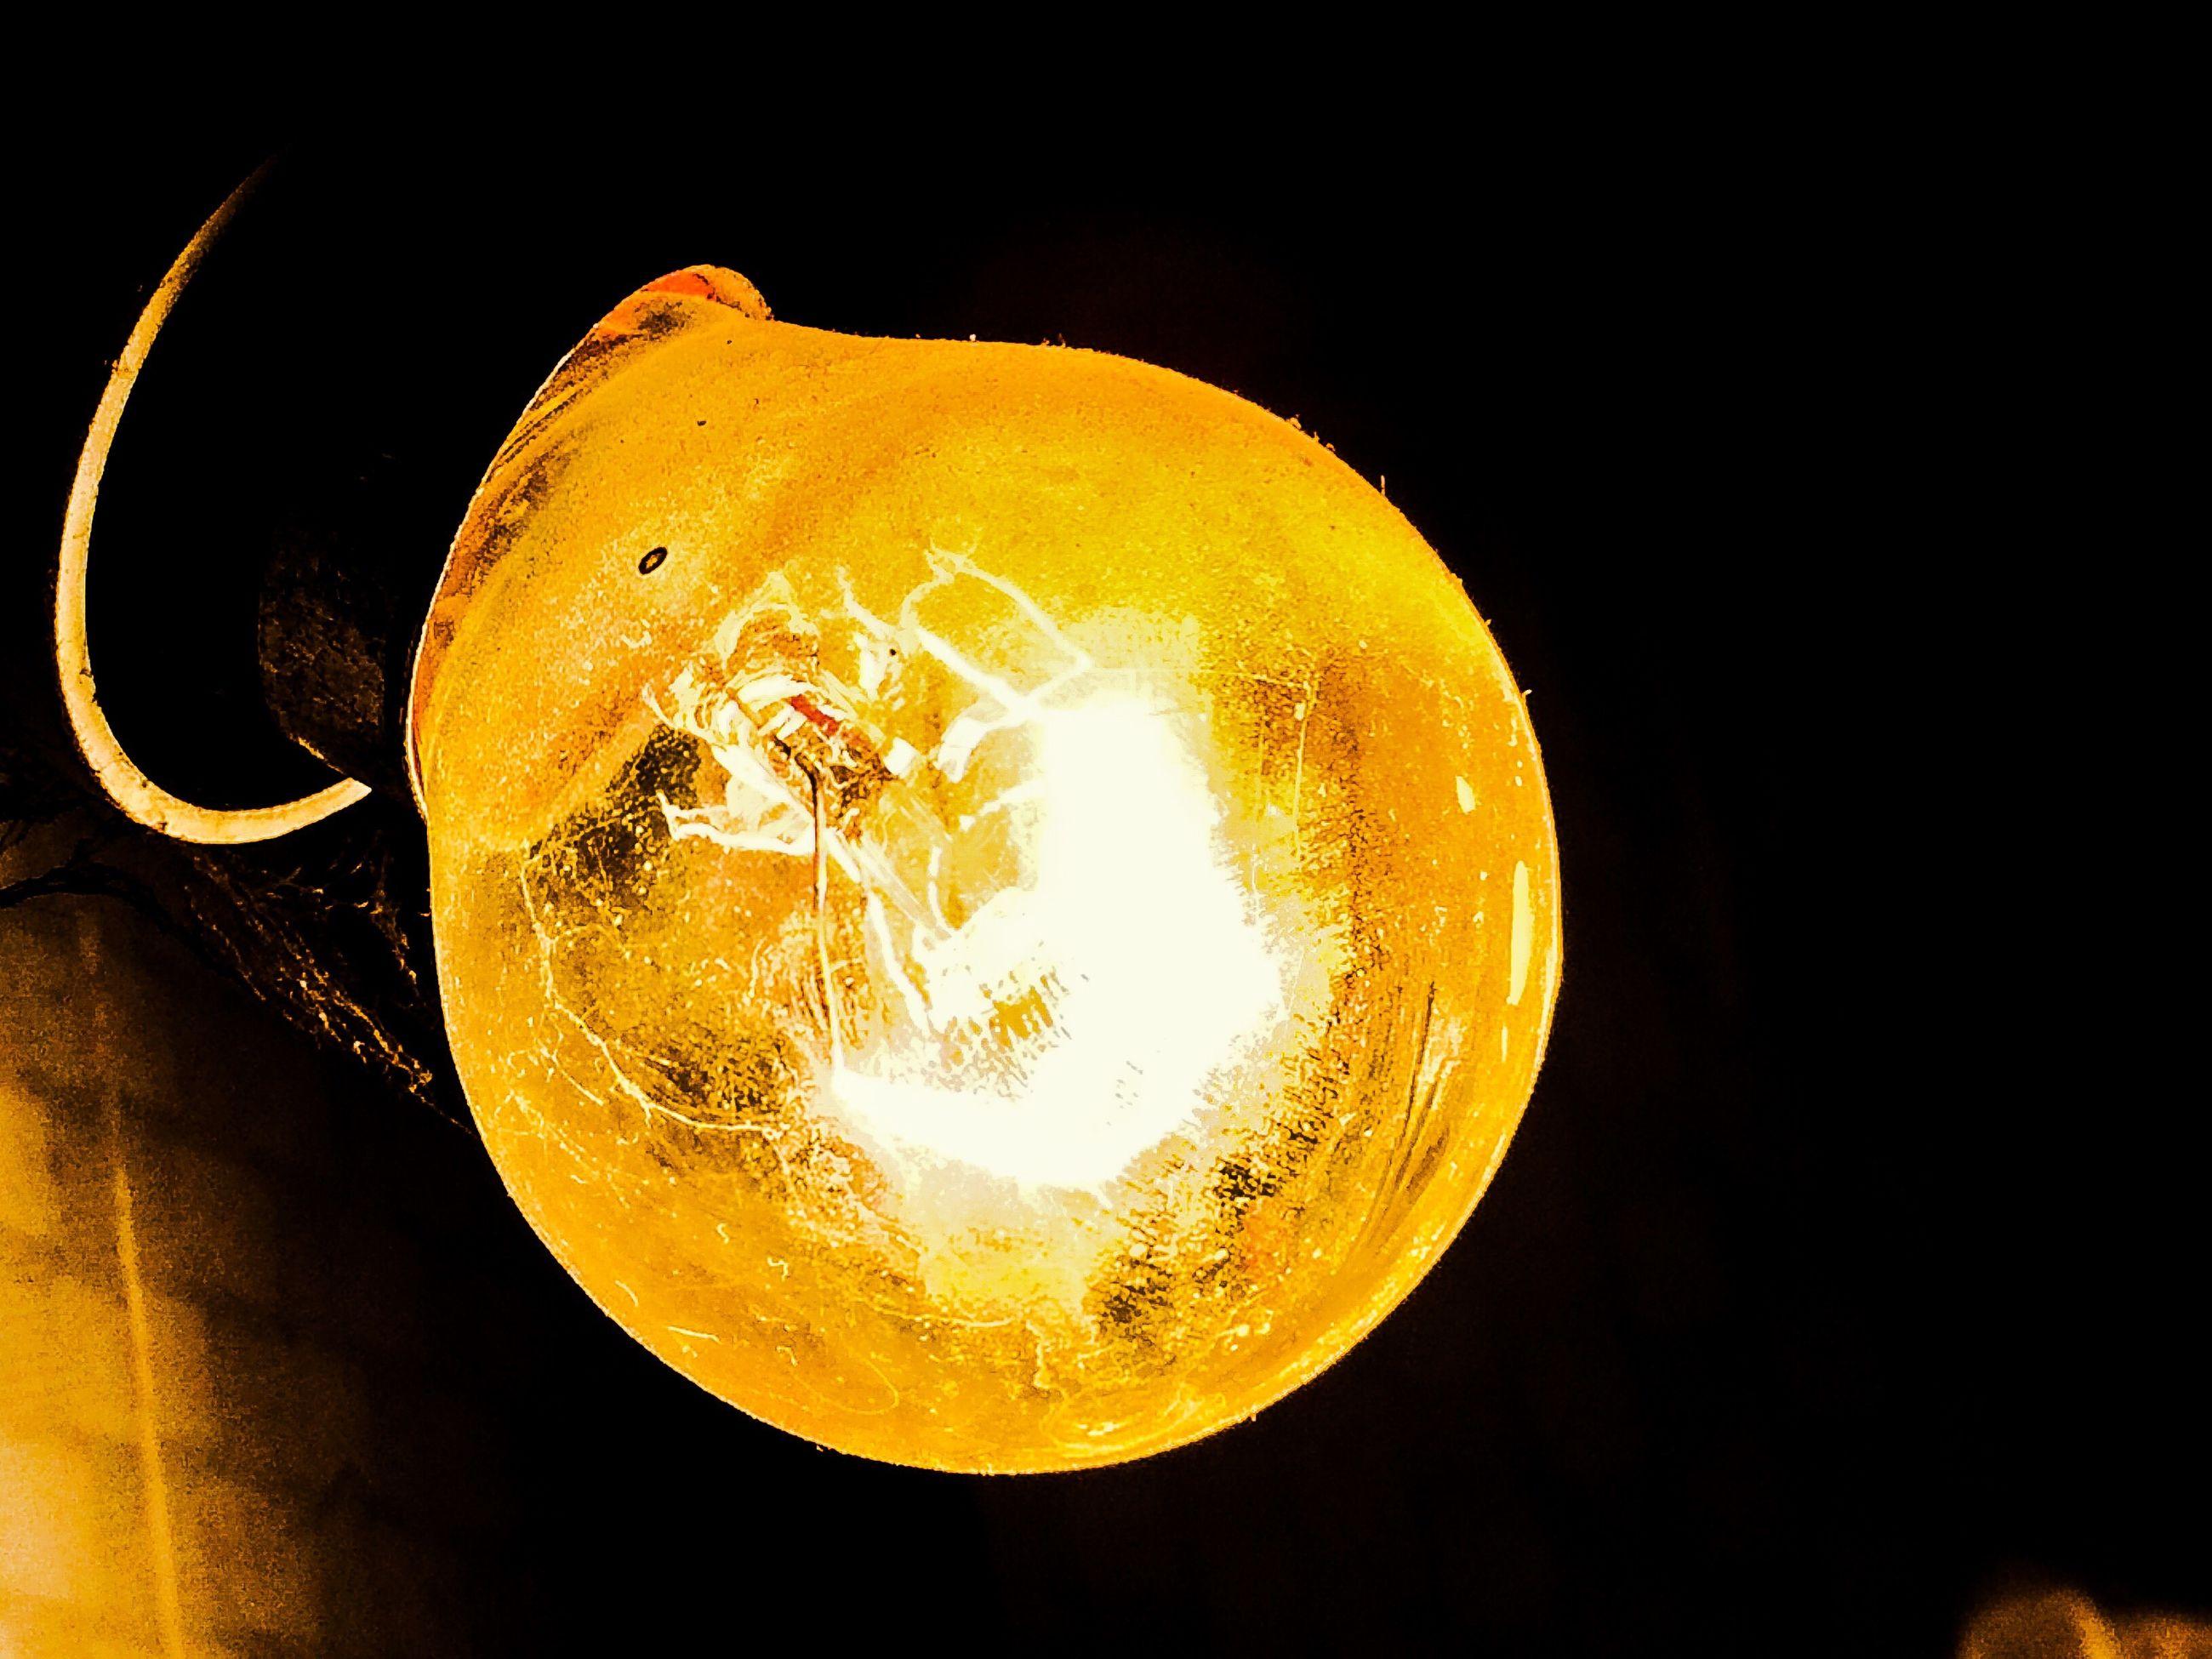 illuminated, close-up, studio shot, indoors, black background, night, yellow, glowing, still life, dark, copy space, lighting equipment, light bulb, lit, electricity, no people, single object, orange color, light - natural phenomenon, glass - material